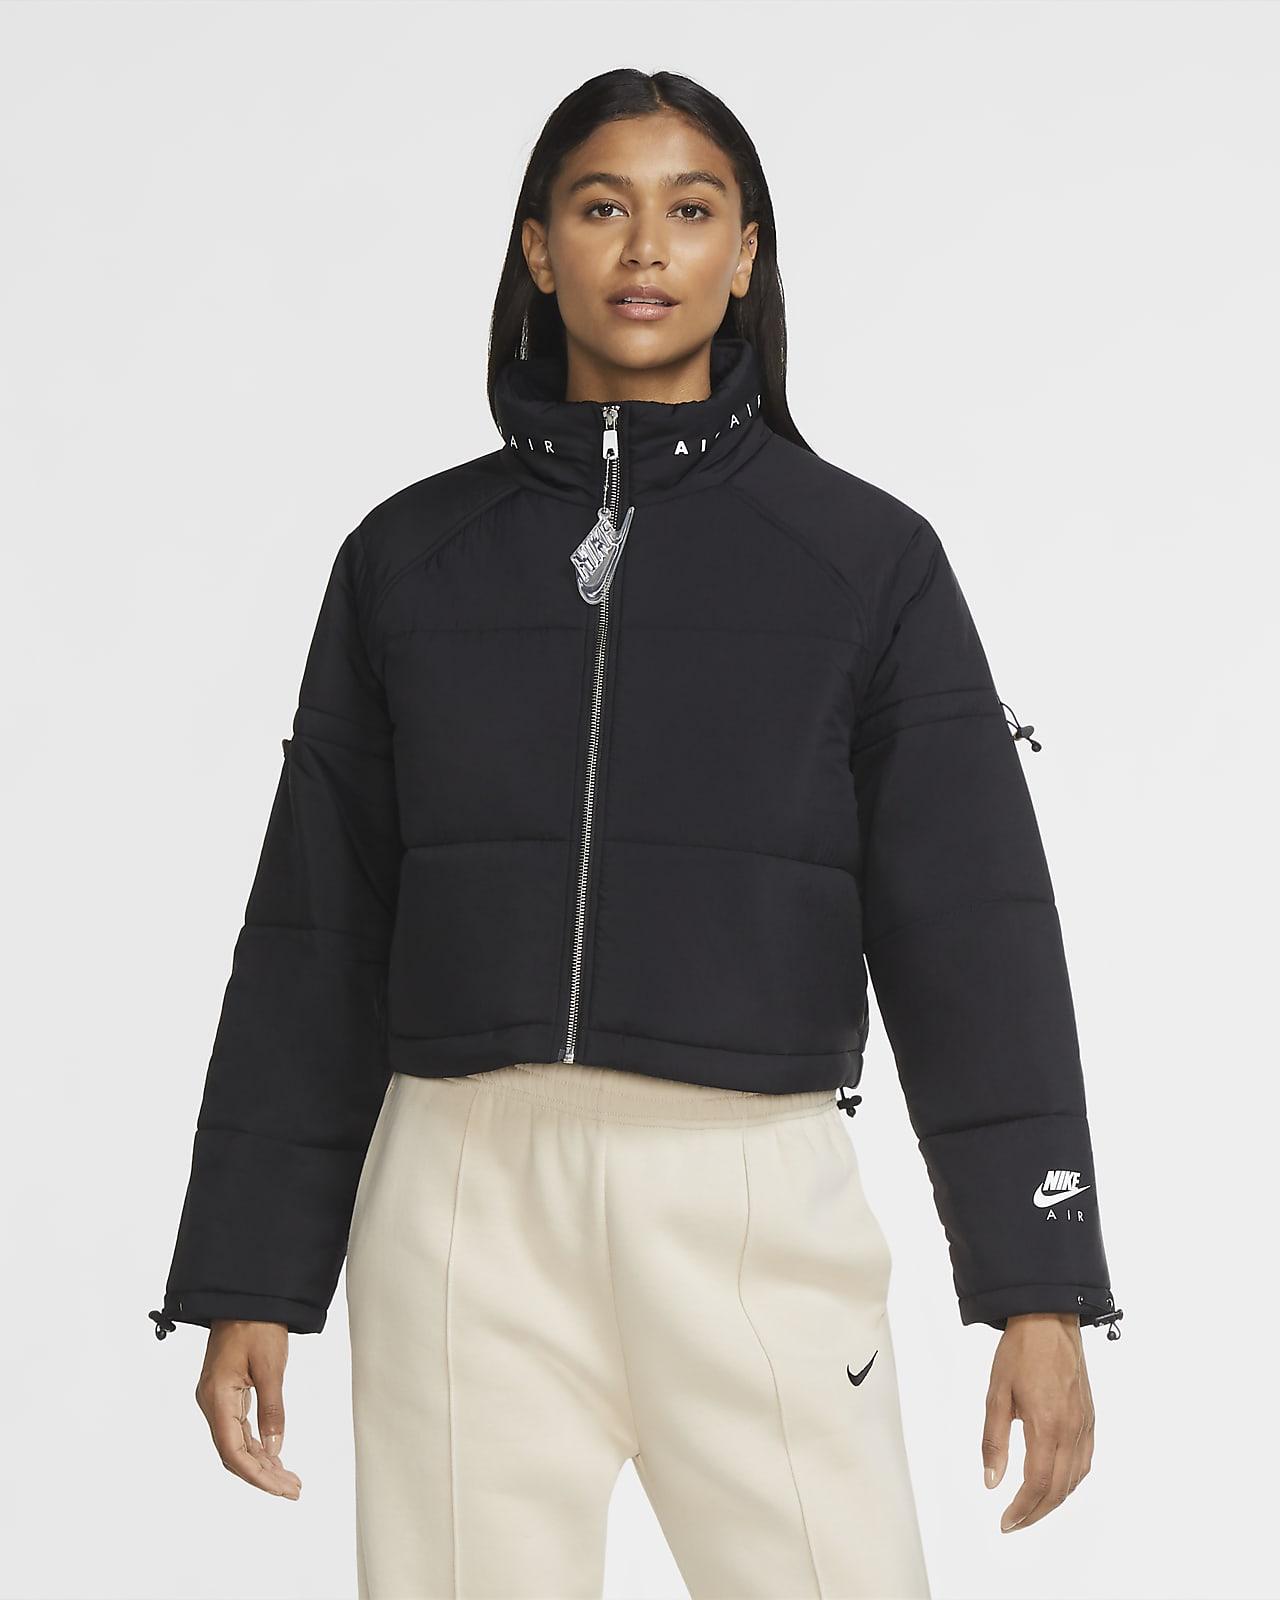 Dámská bunda Nike AirSynthetic-Fill